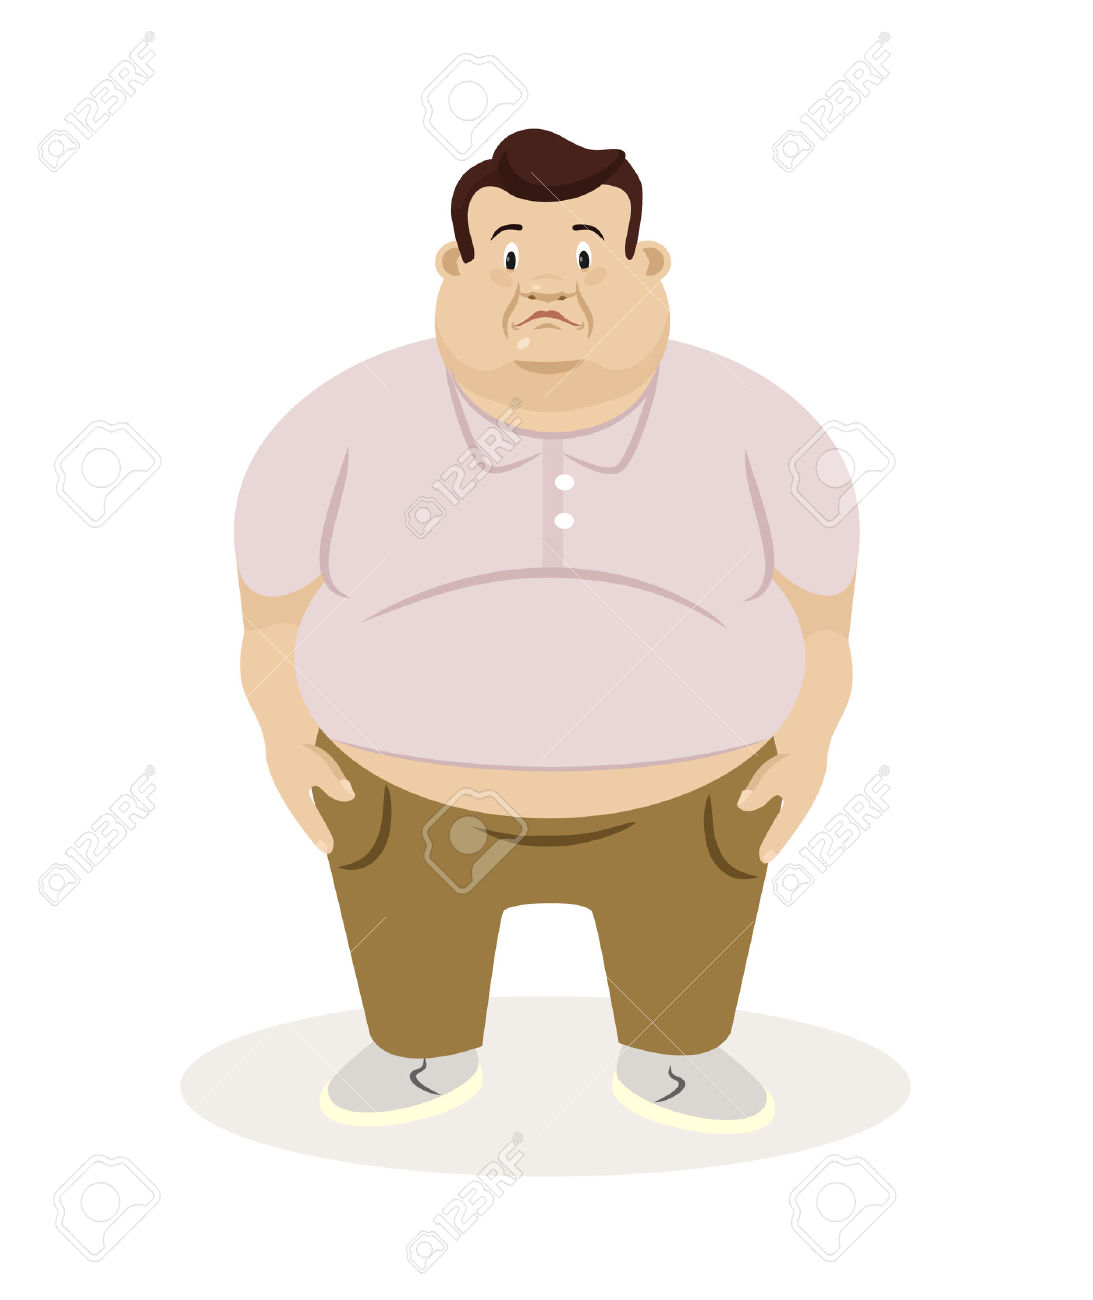 8,382 Fat Man Stock Vector Illustration And Royalty Free Fat Man.